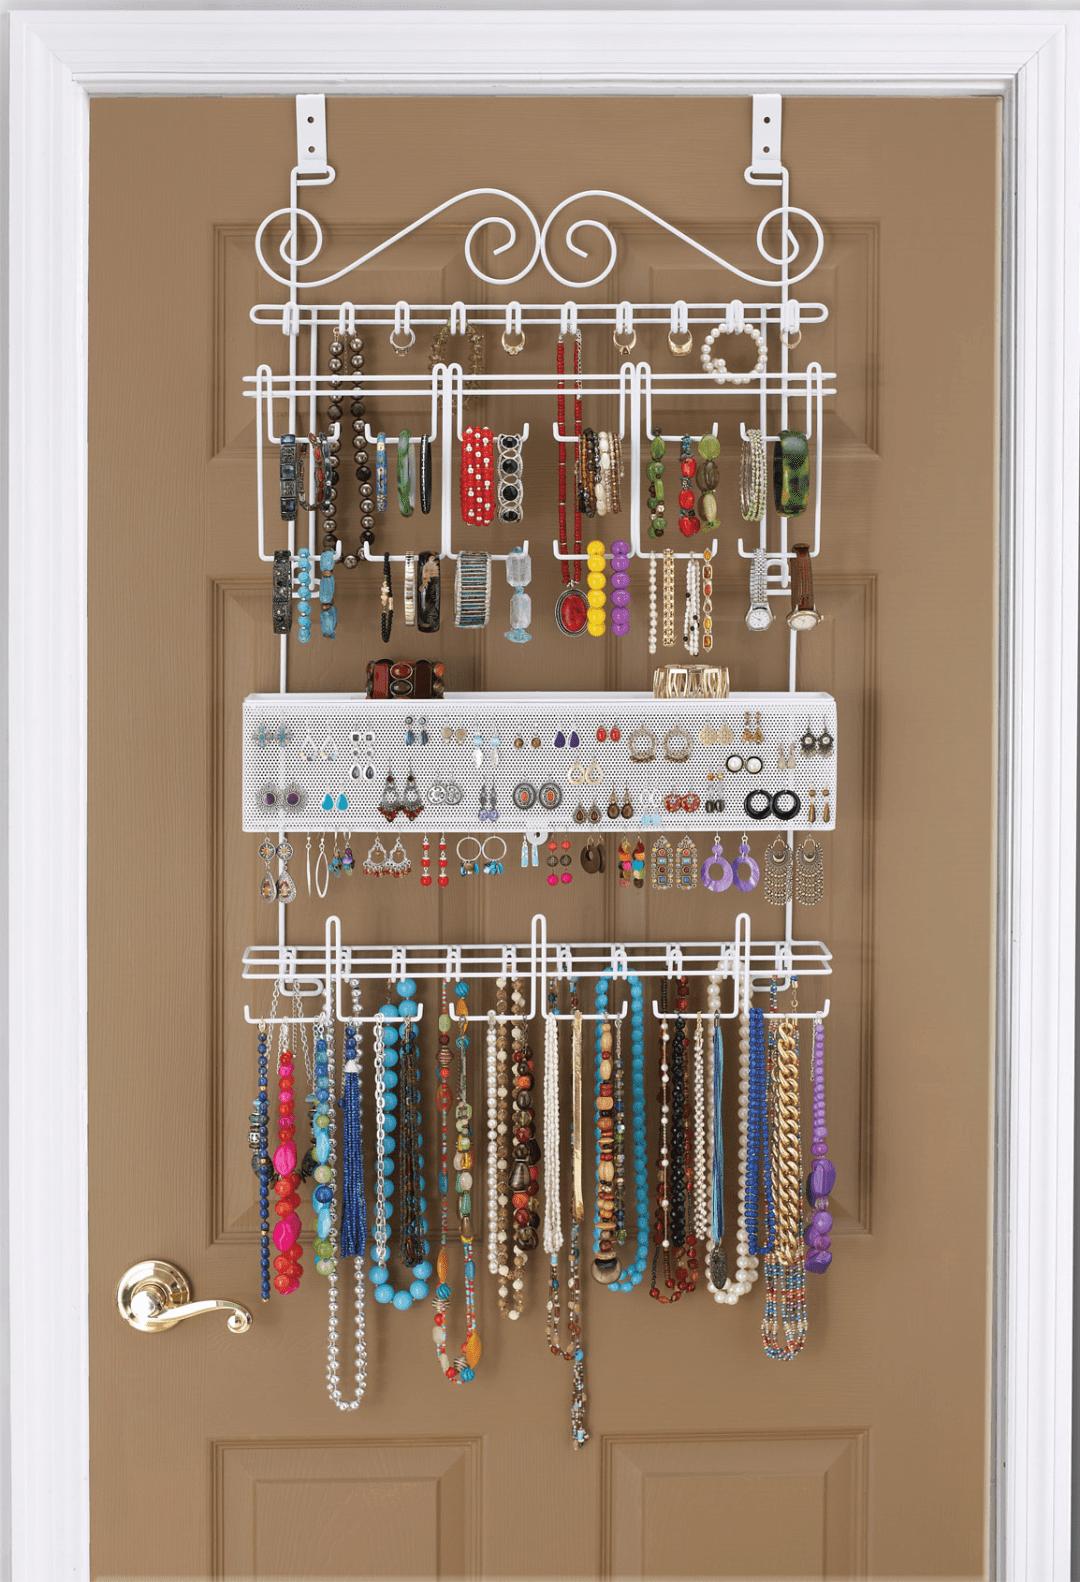 Closet Jewelry Rack Image Of Bathroom And Closet